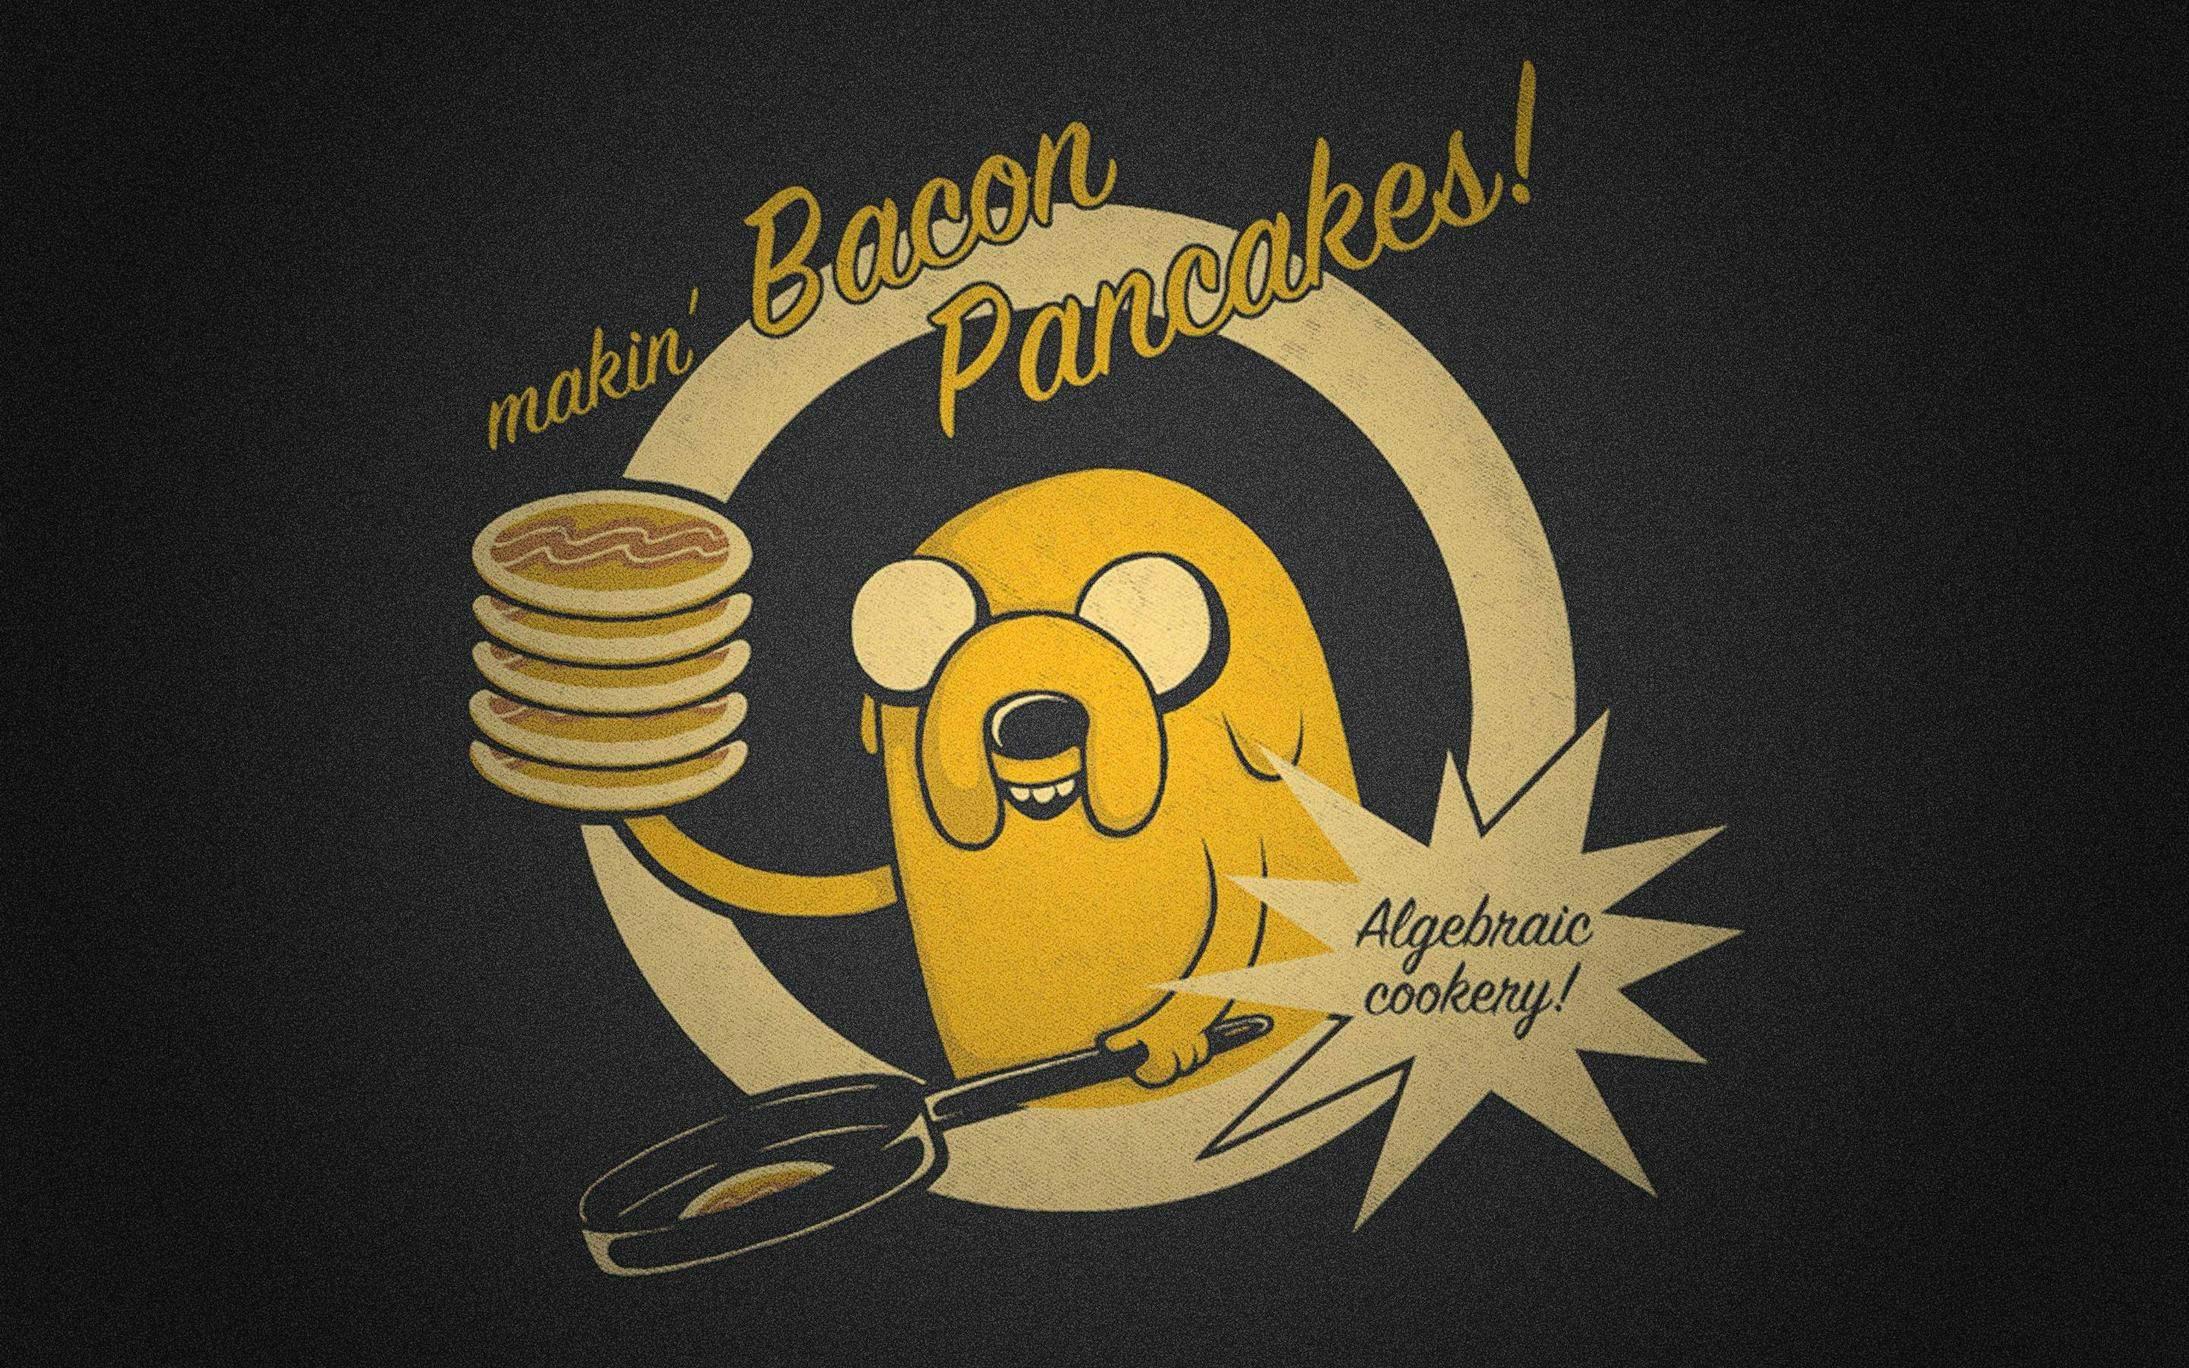 Makin Bacon Pancakes Adventure Time [2189 x 1368] wallpapers 2189x1368